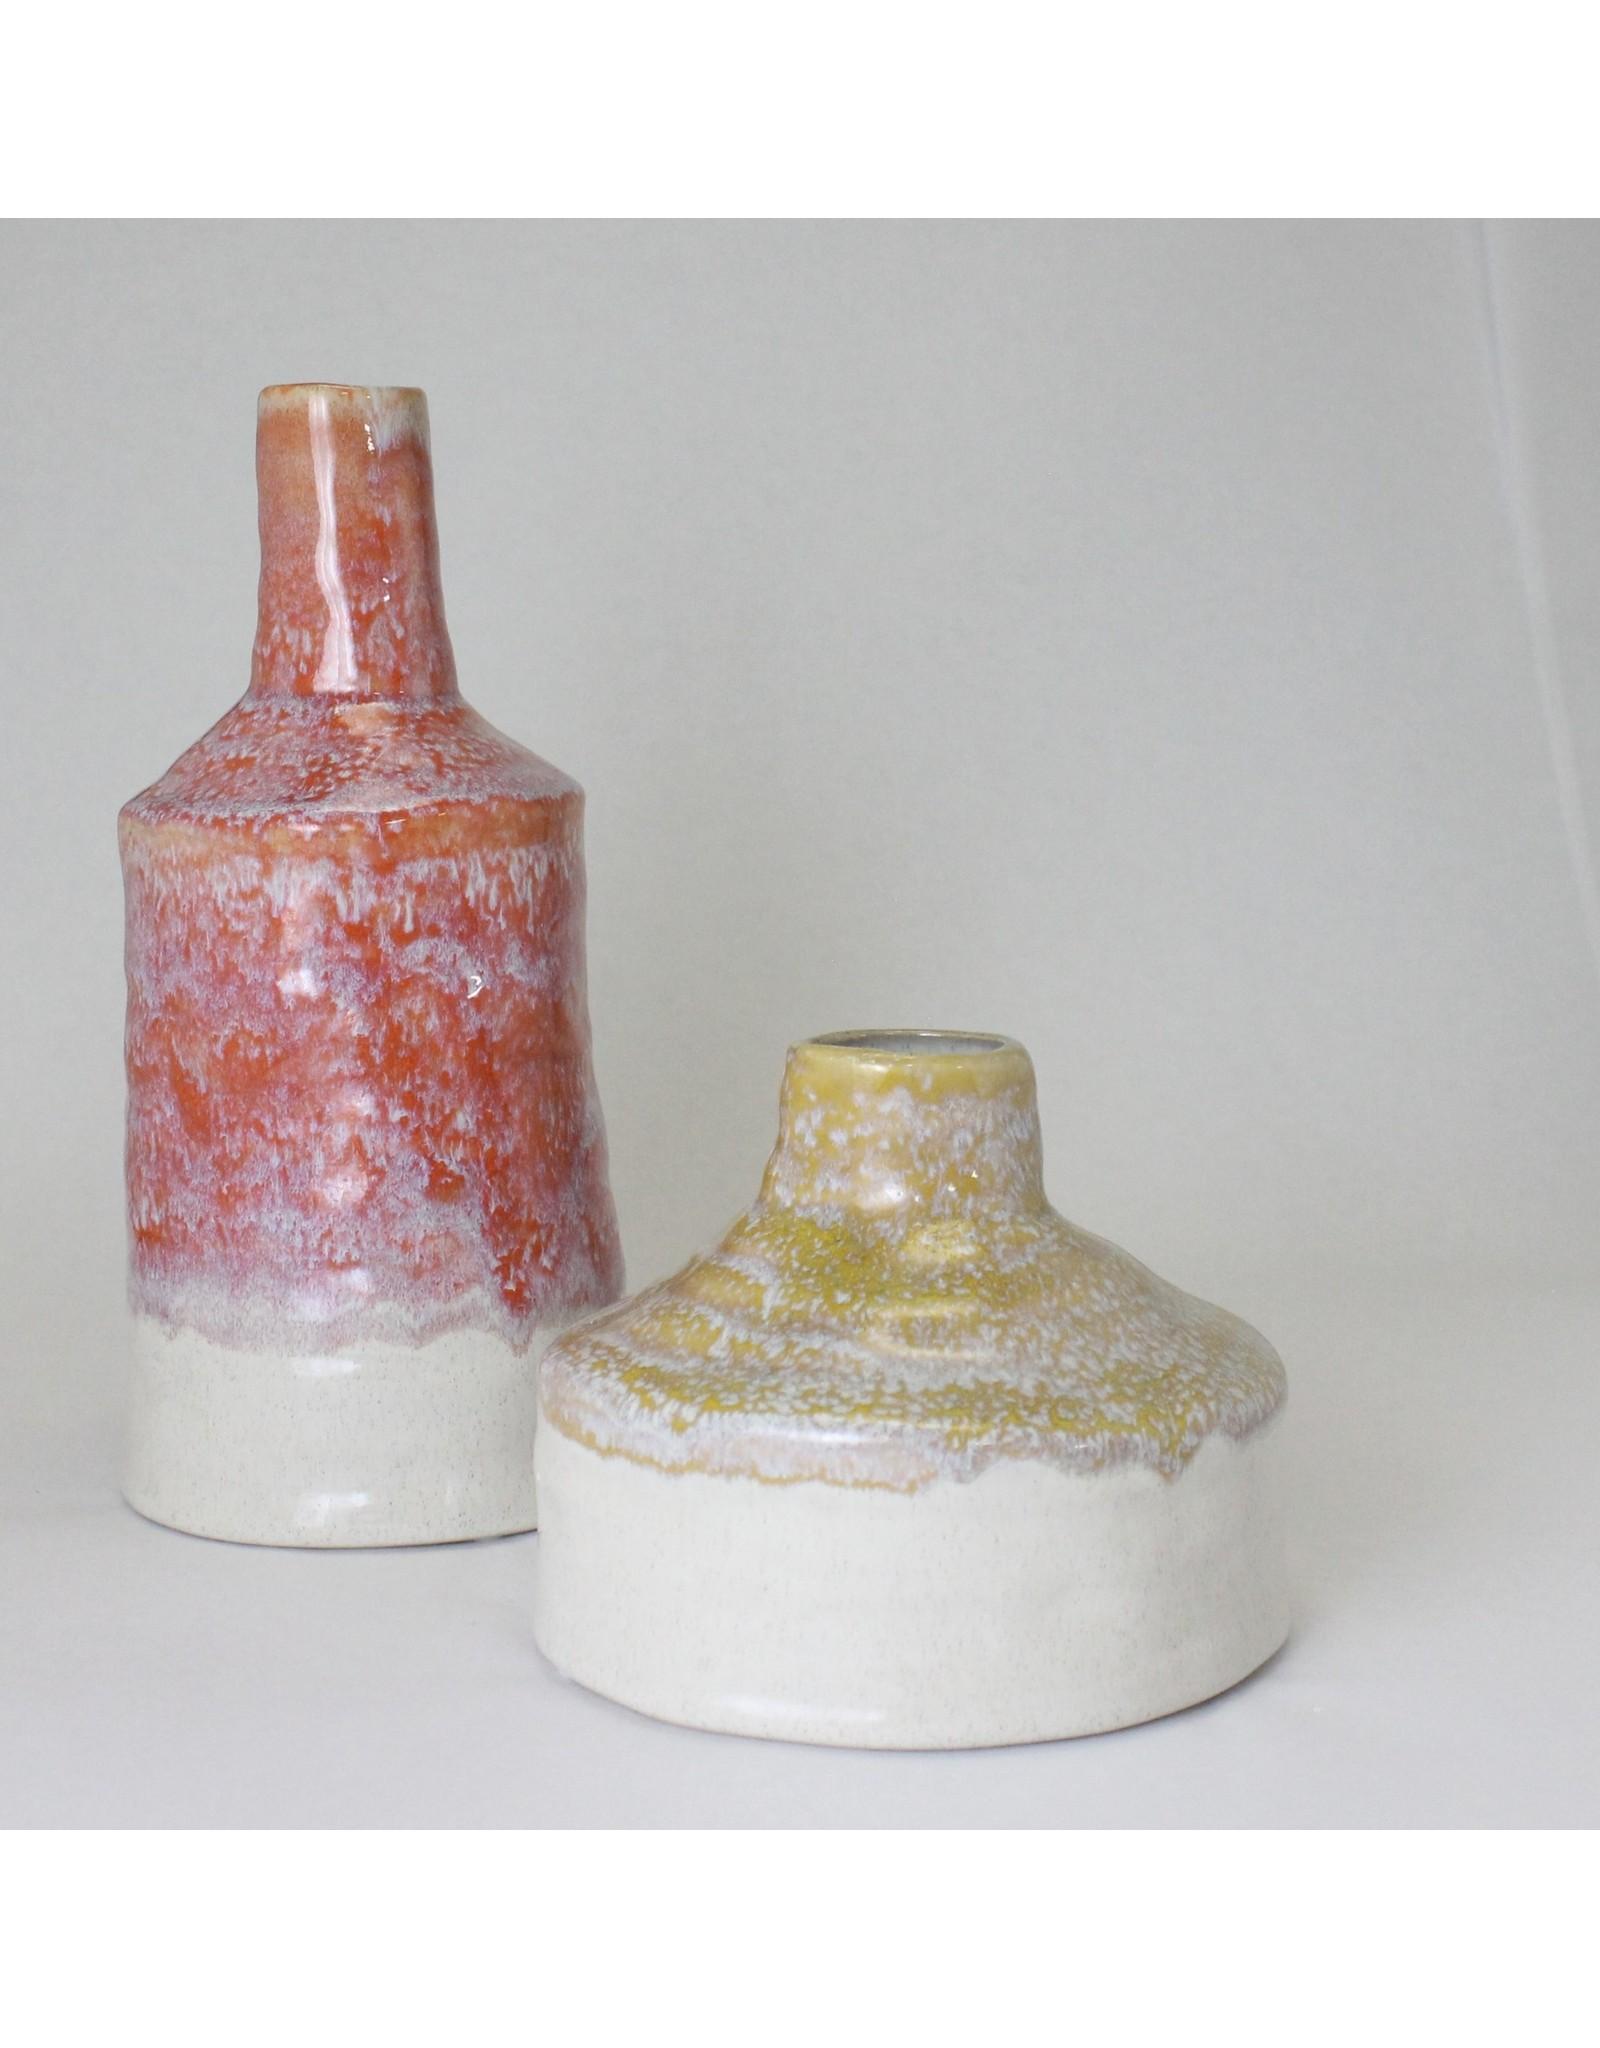 Salmon and Cream Stoneware Vase Glaze